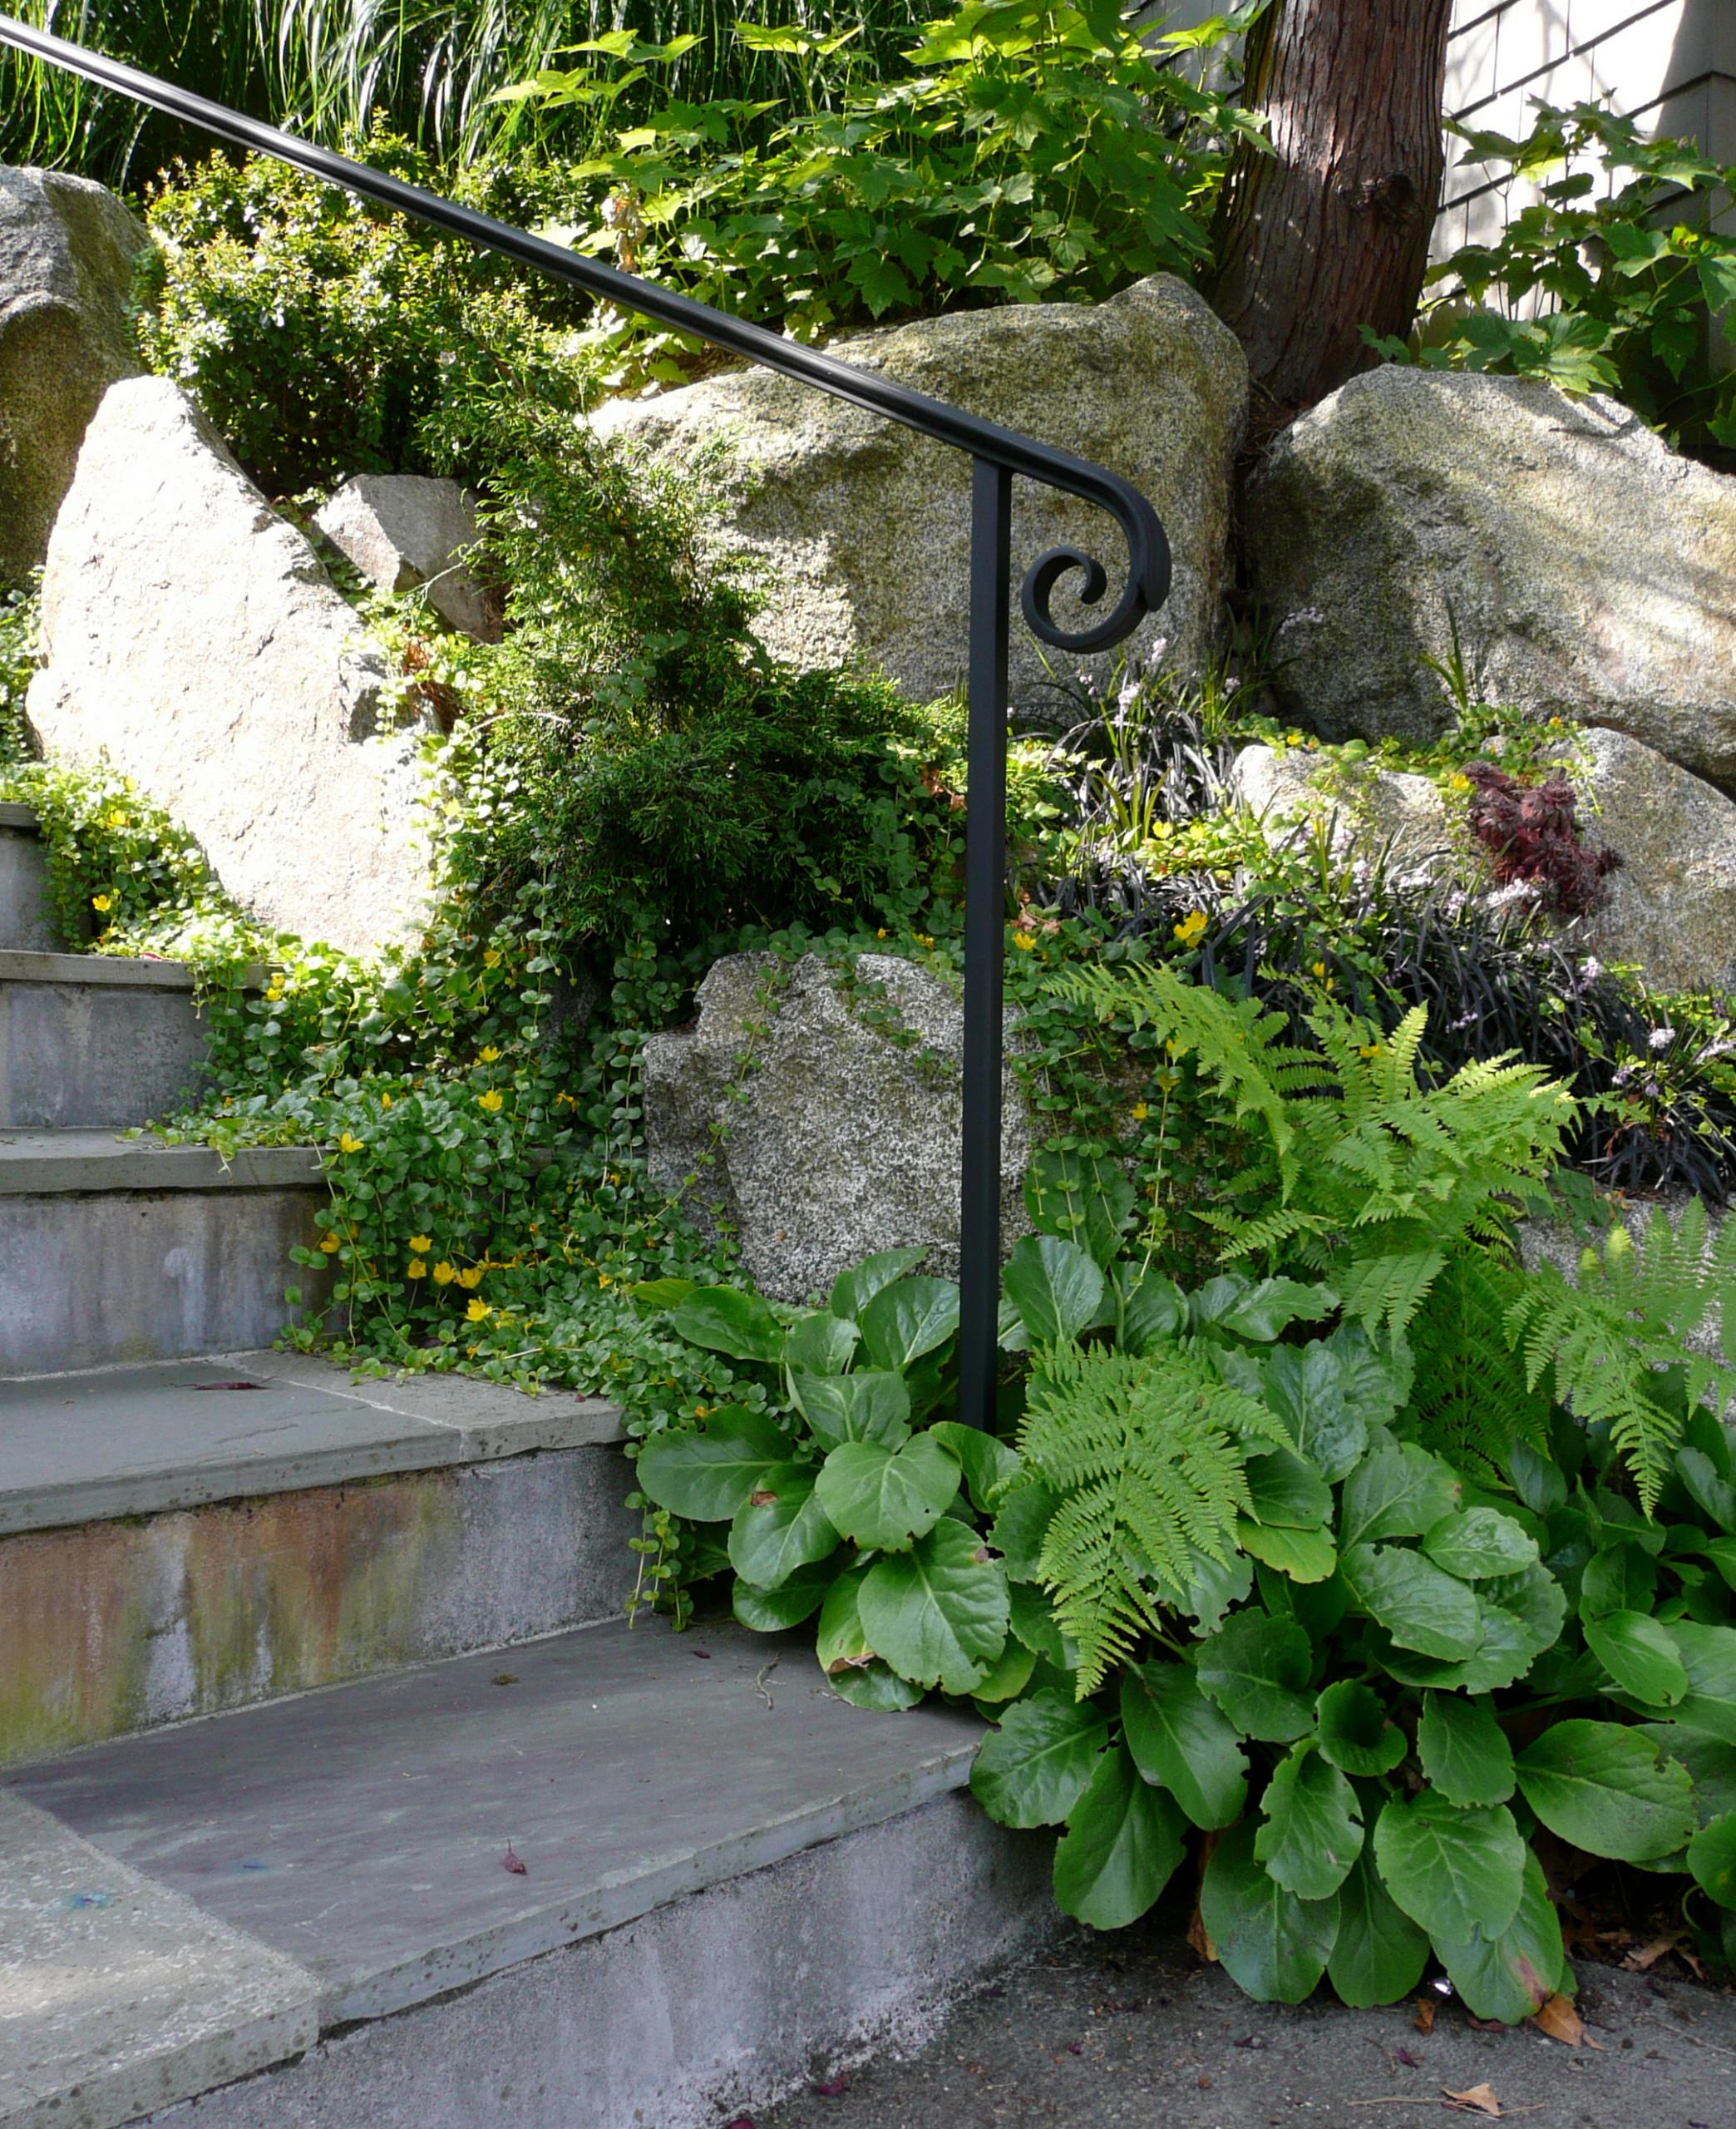 Montlake Gardenscapes